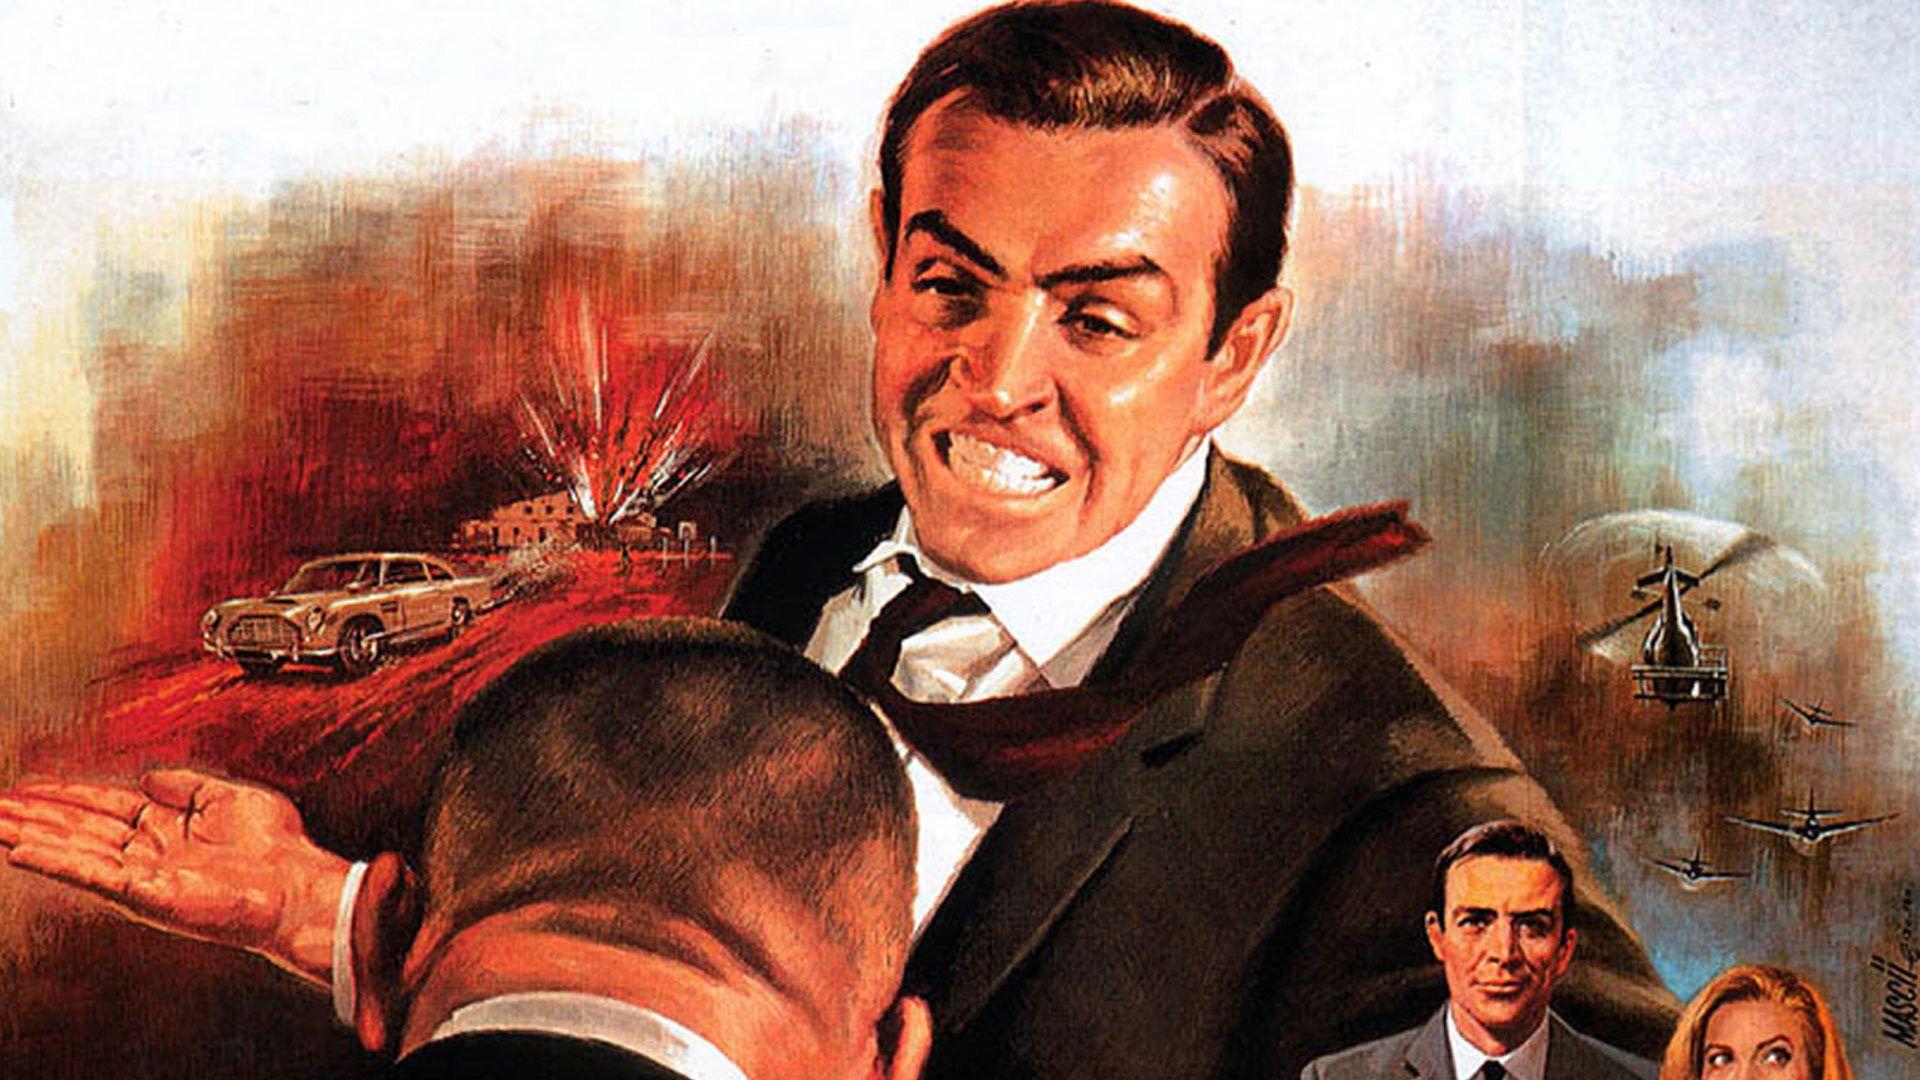 007 artwork james bond sean connery james bond free